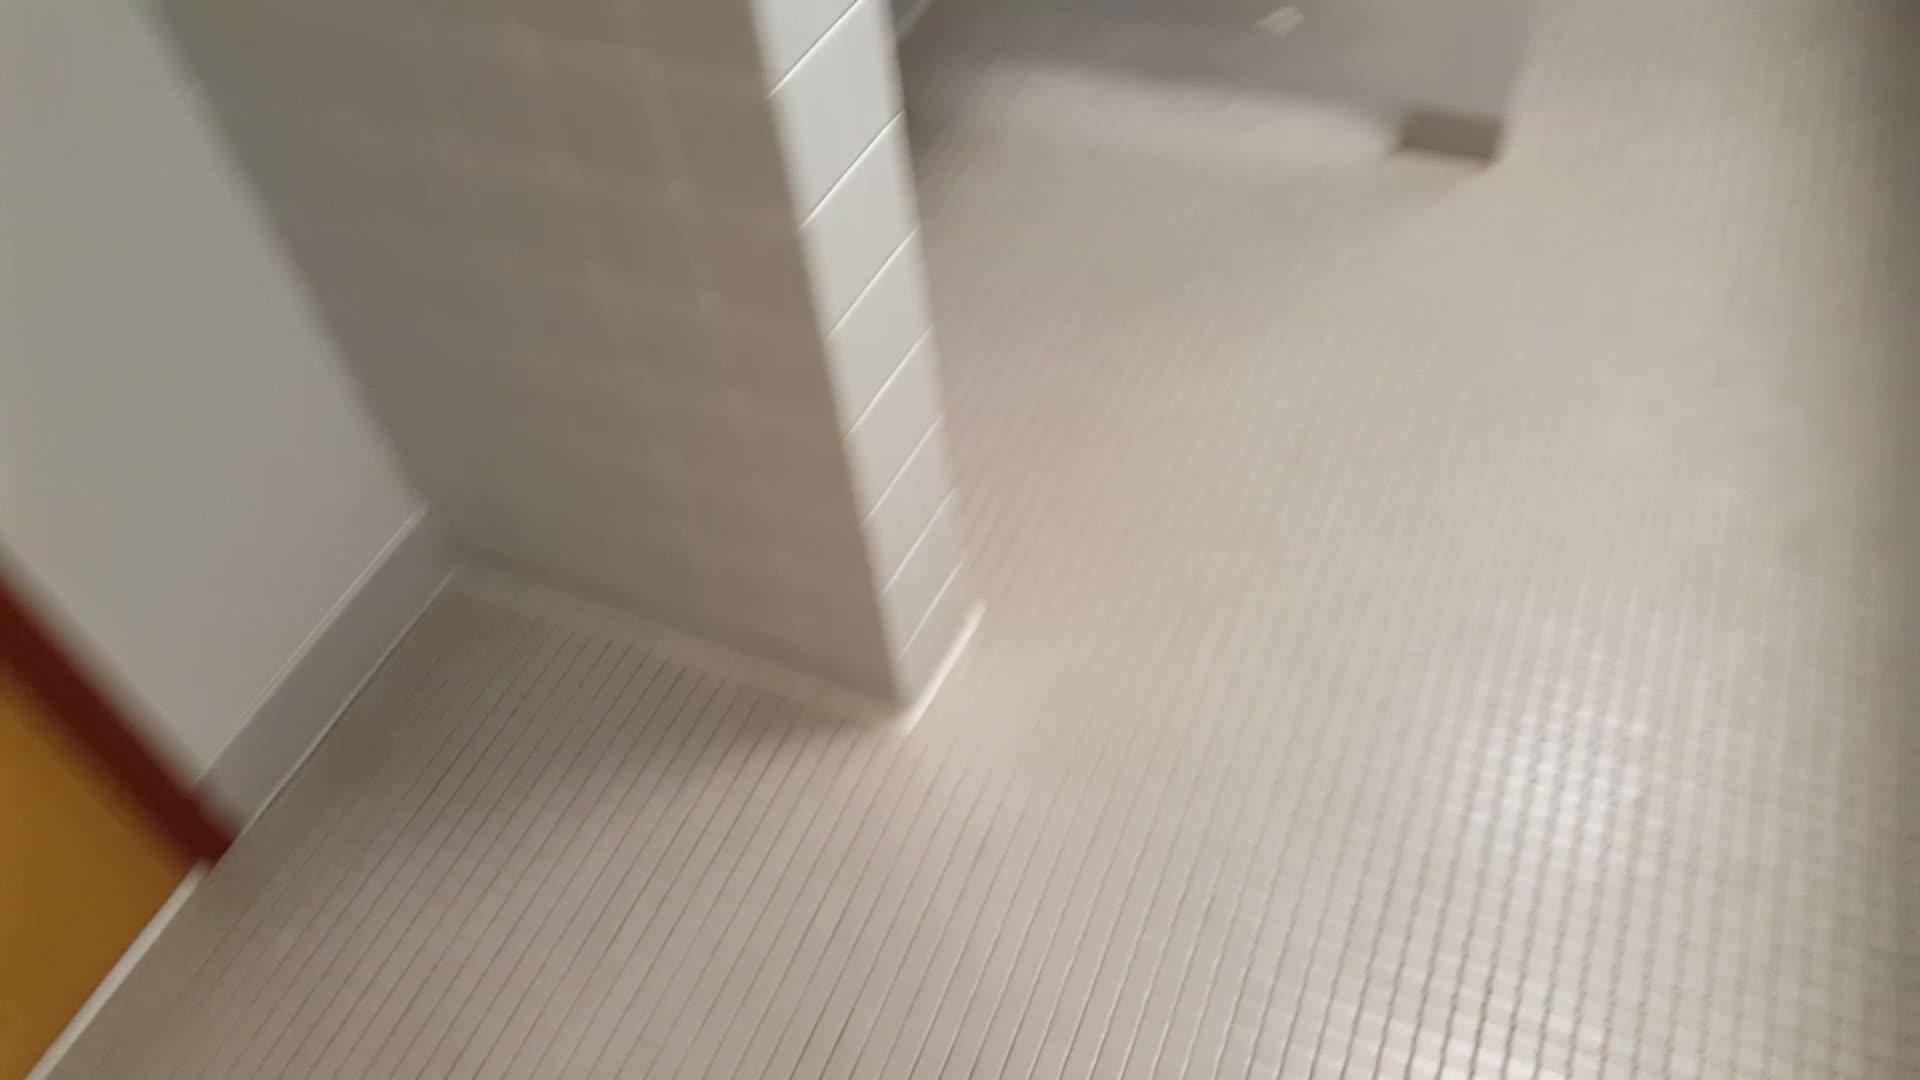 CrappyDesign, Weird tiny bathroom GIFs